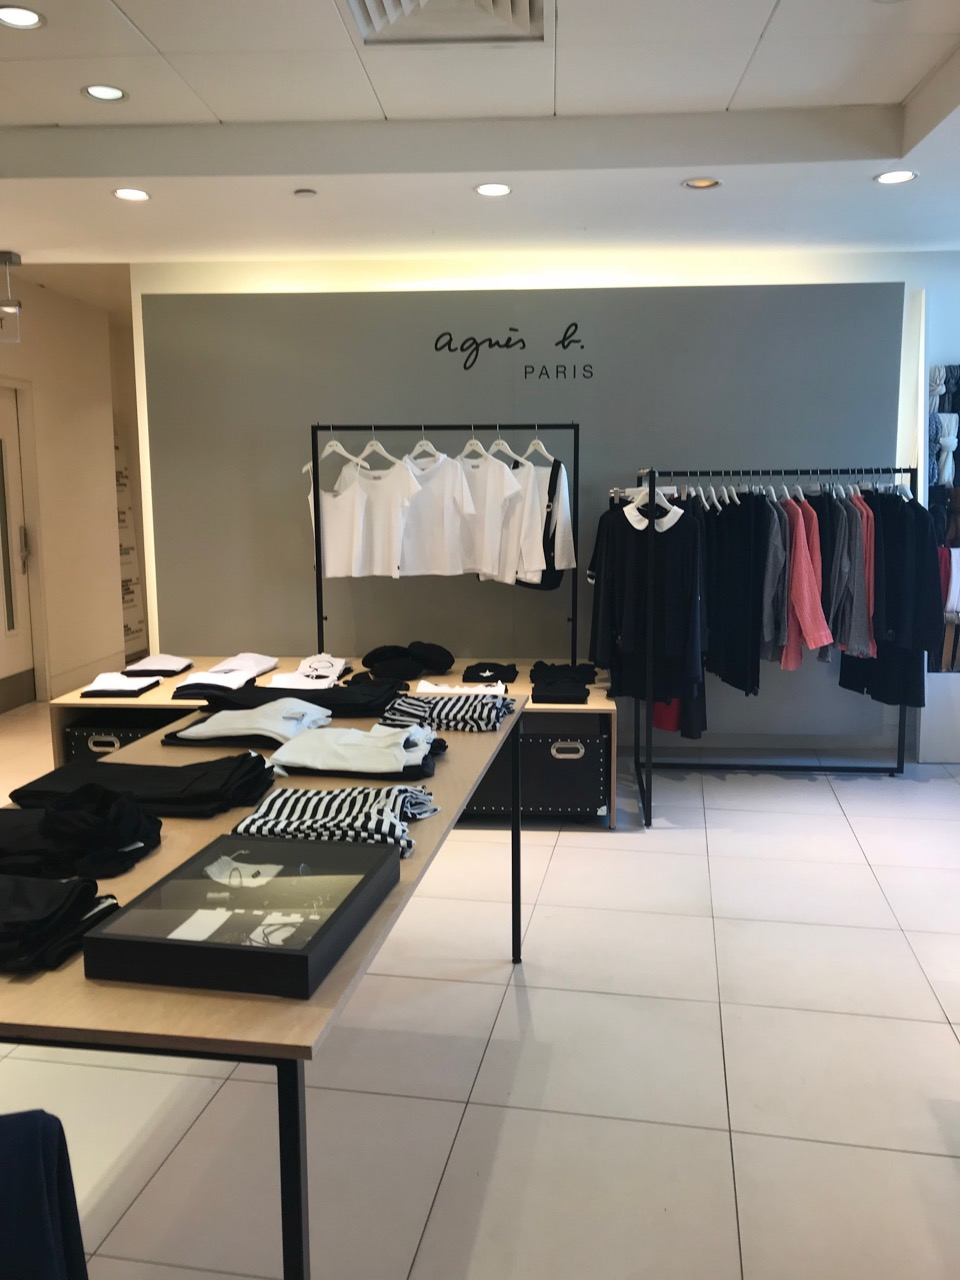 Agnes b Concession at Fenwicks of Bond Street London